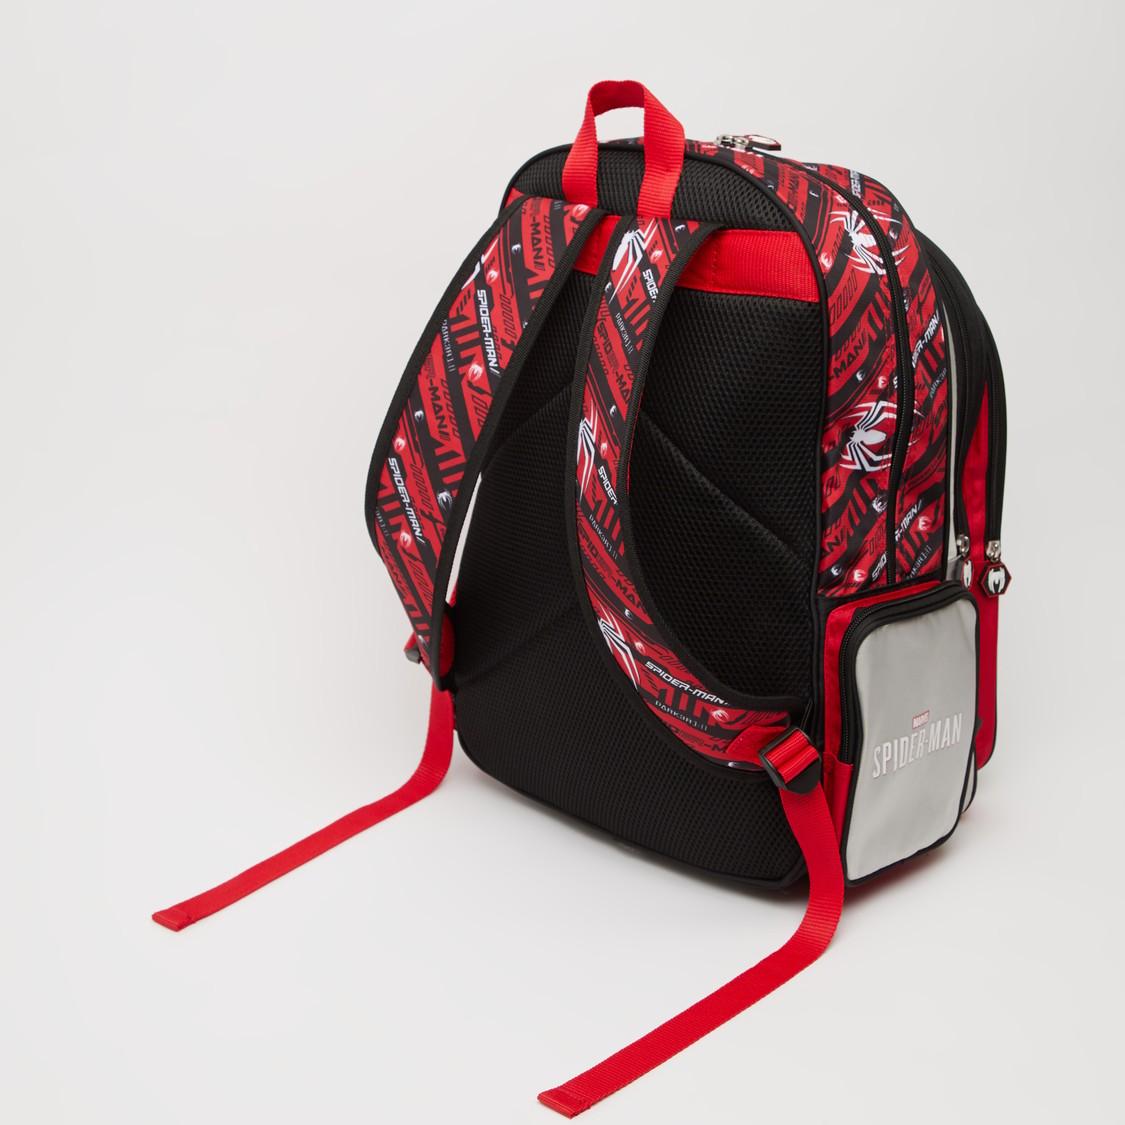 Spider-Man Print Backpack with Adjsutable Shoulder Straps - 18 Inches